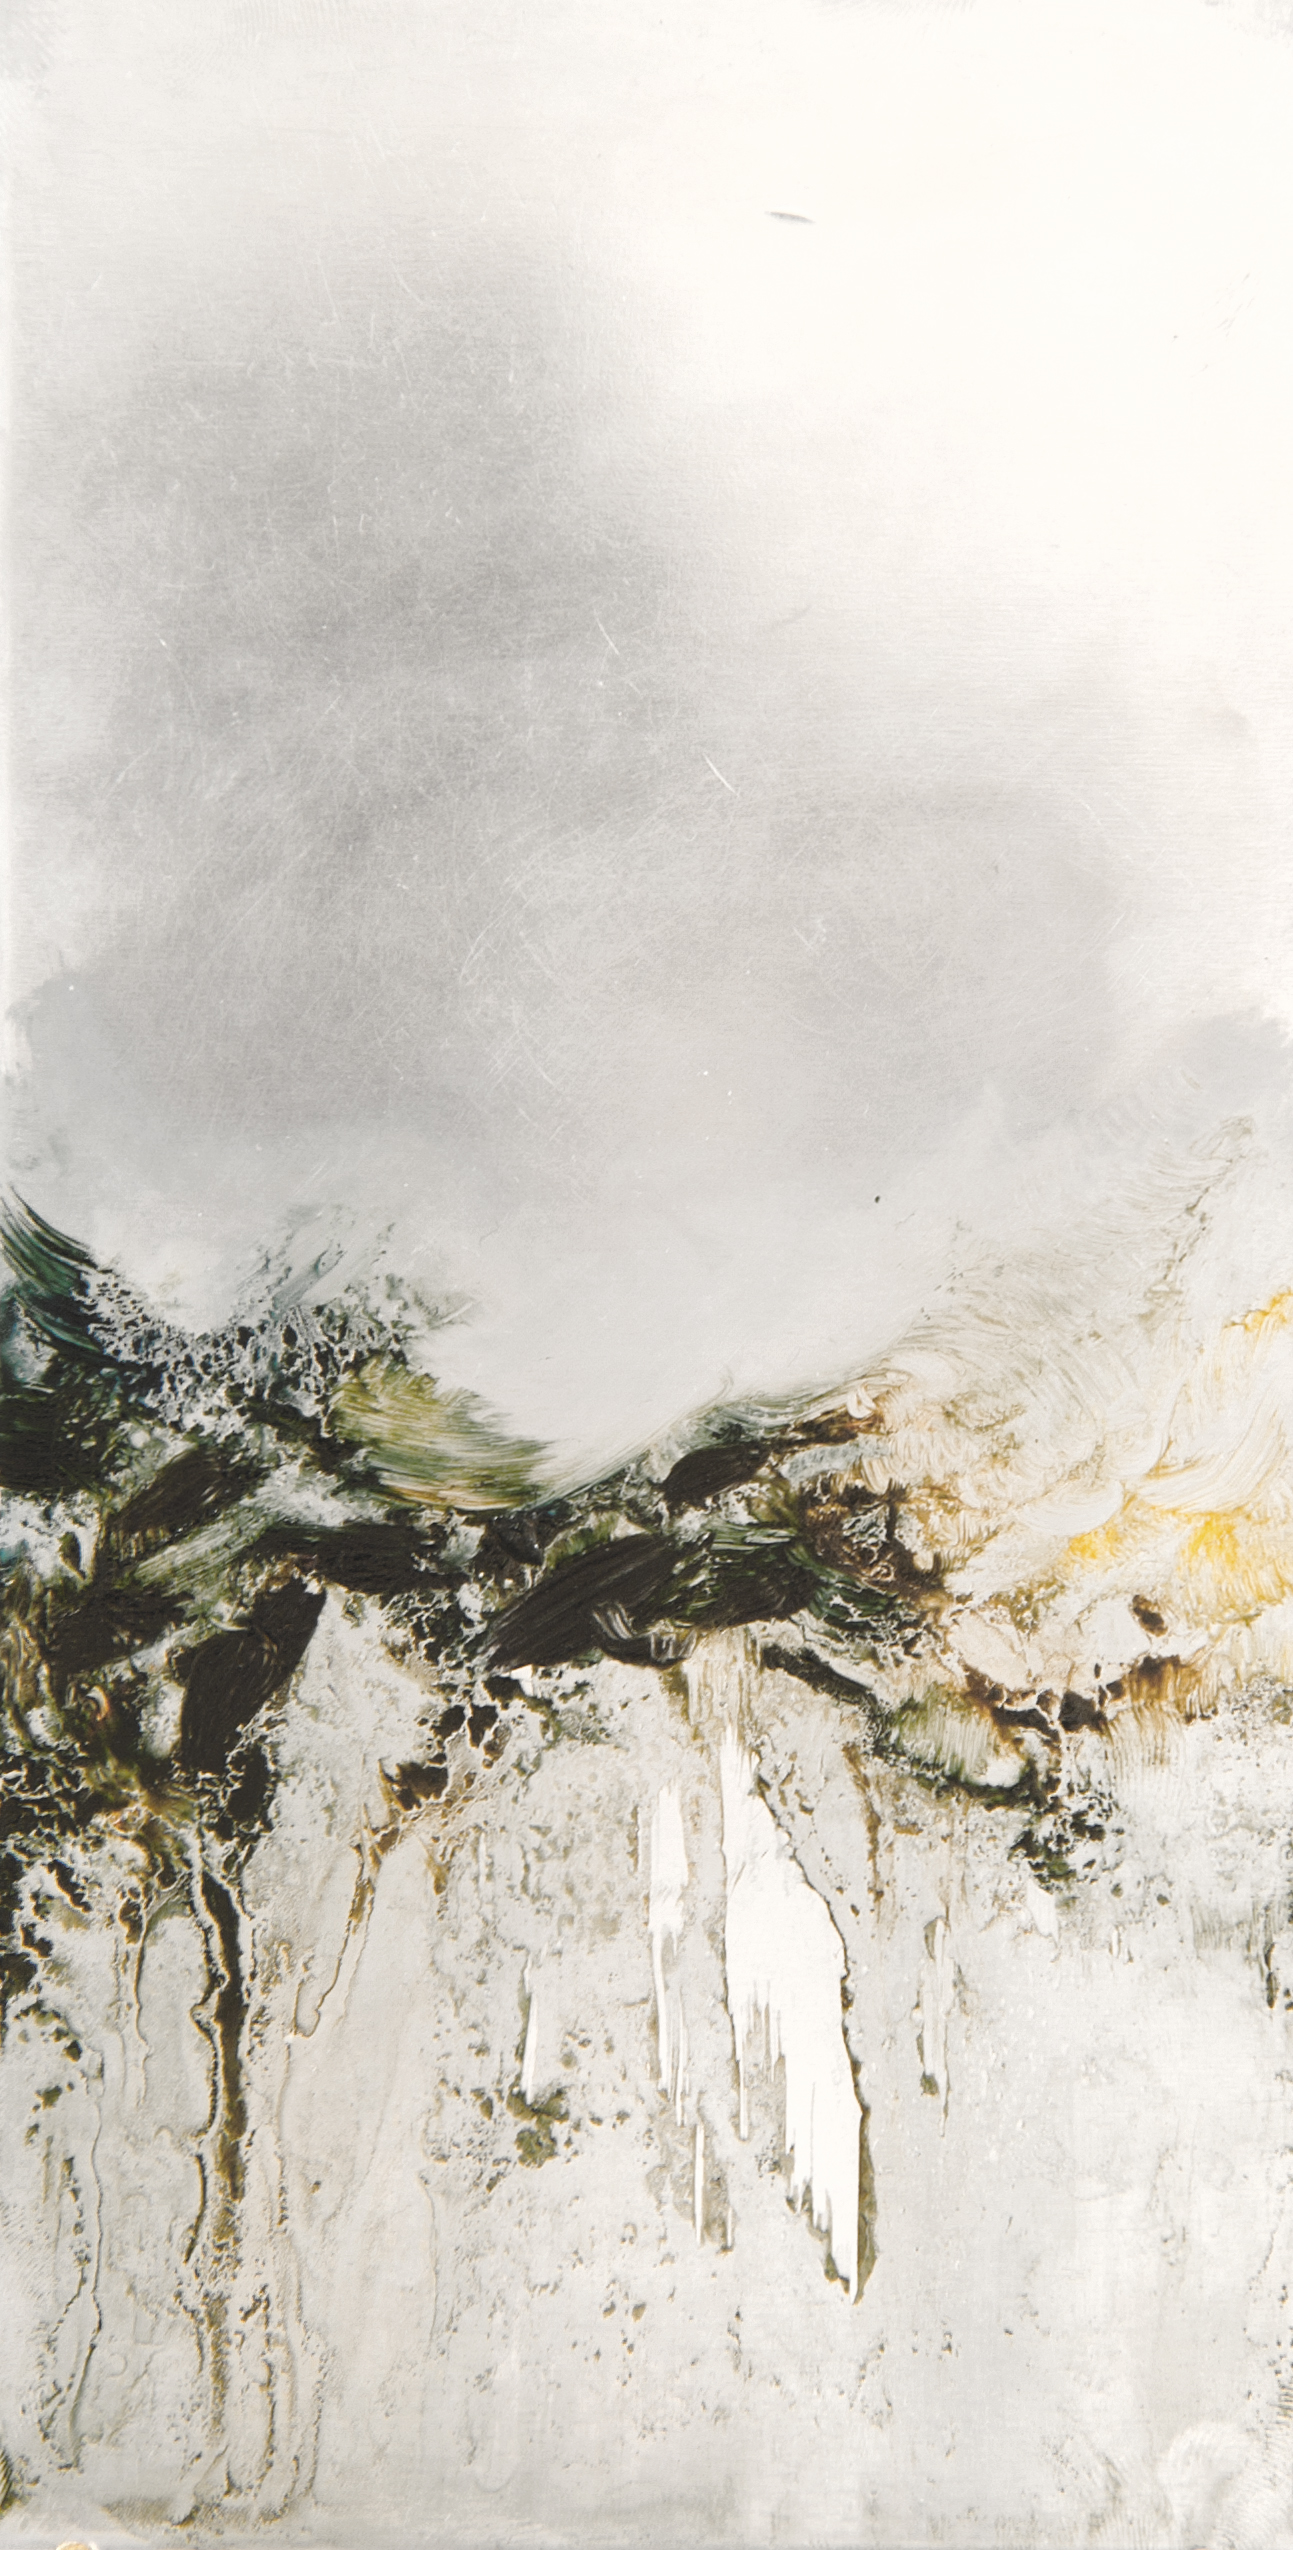 Transient Cascade 3